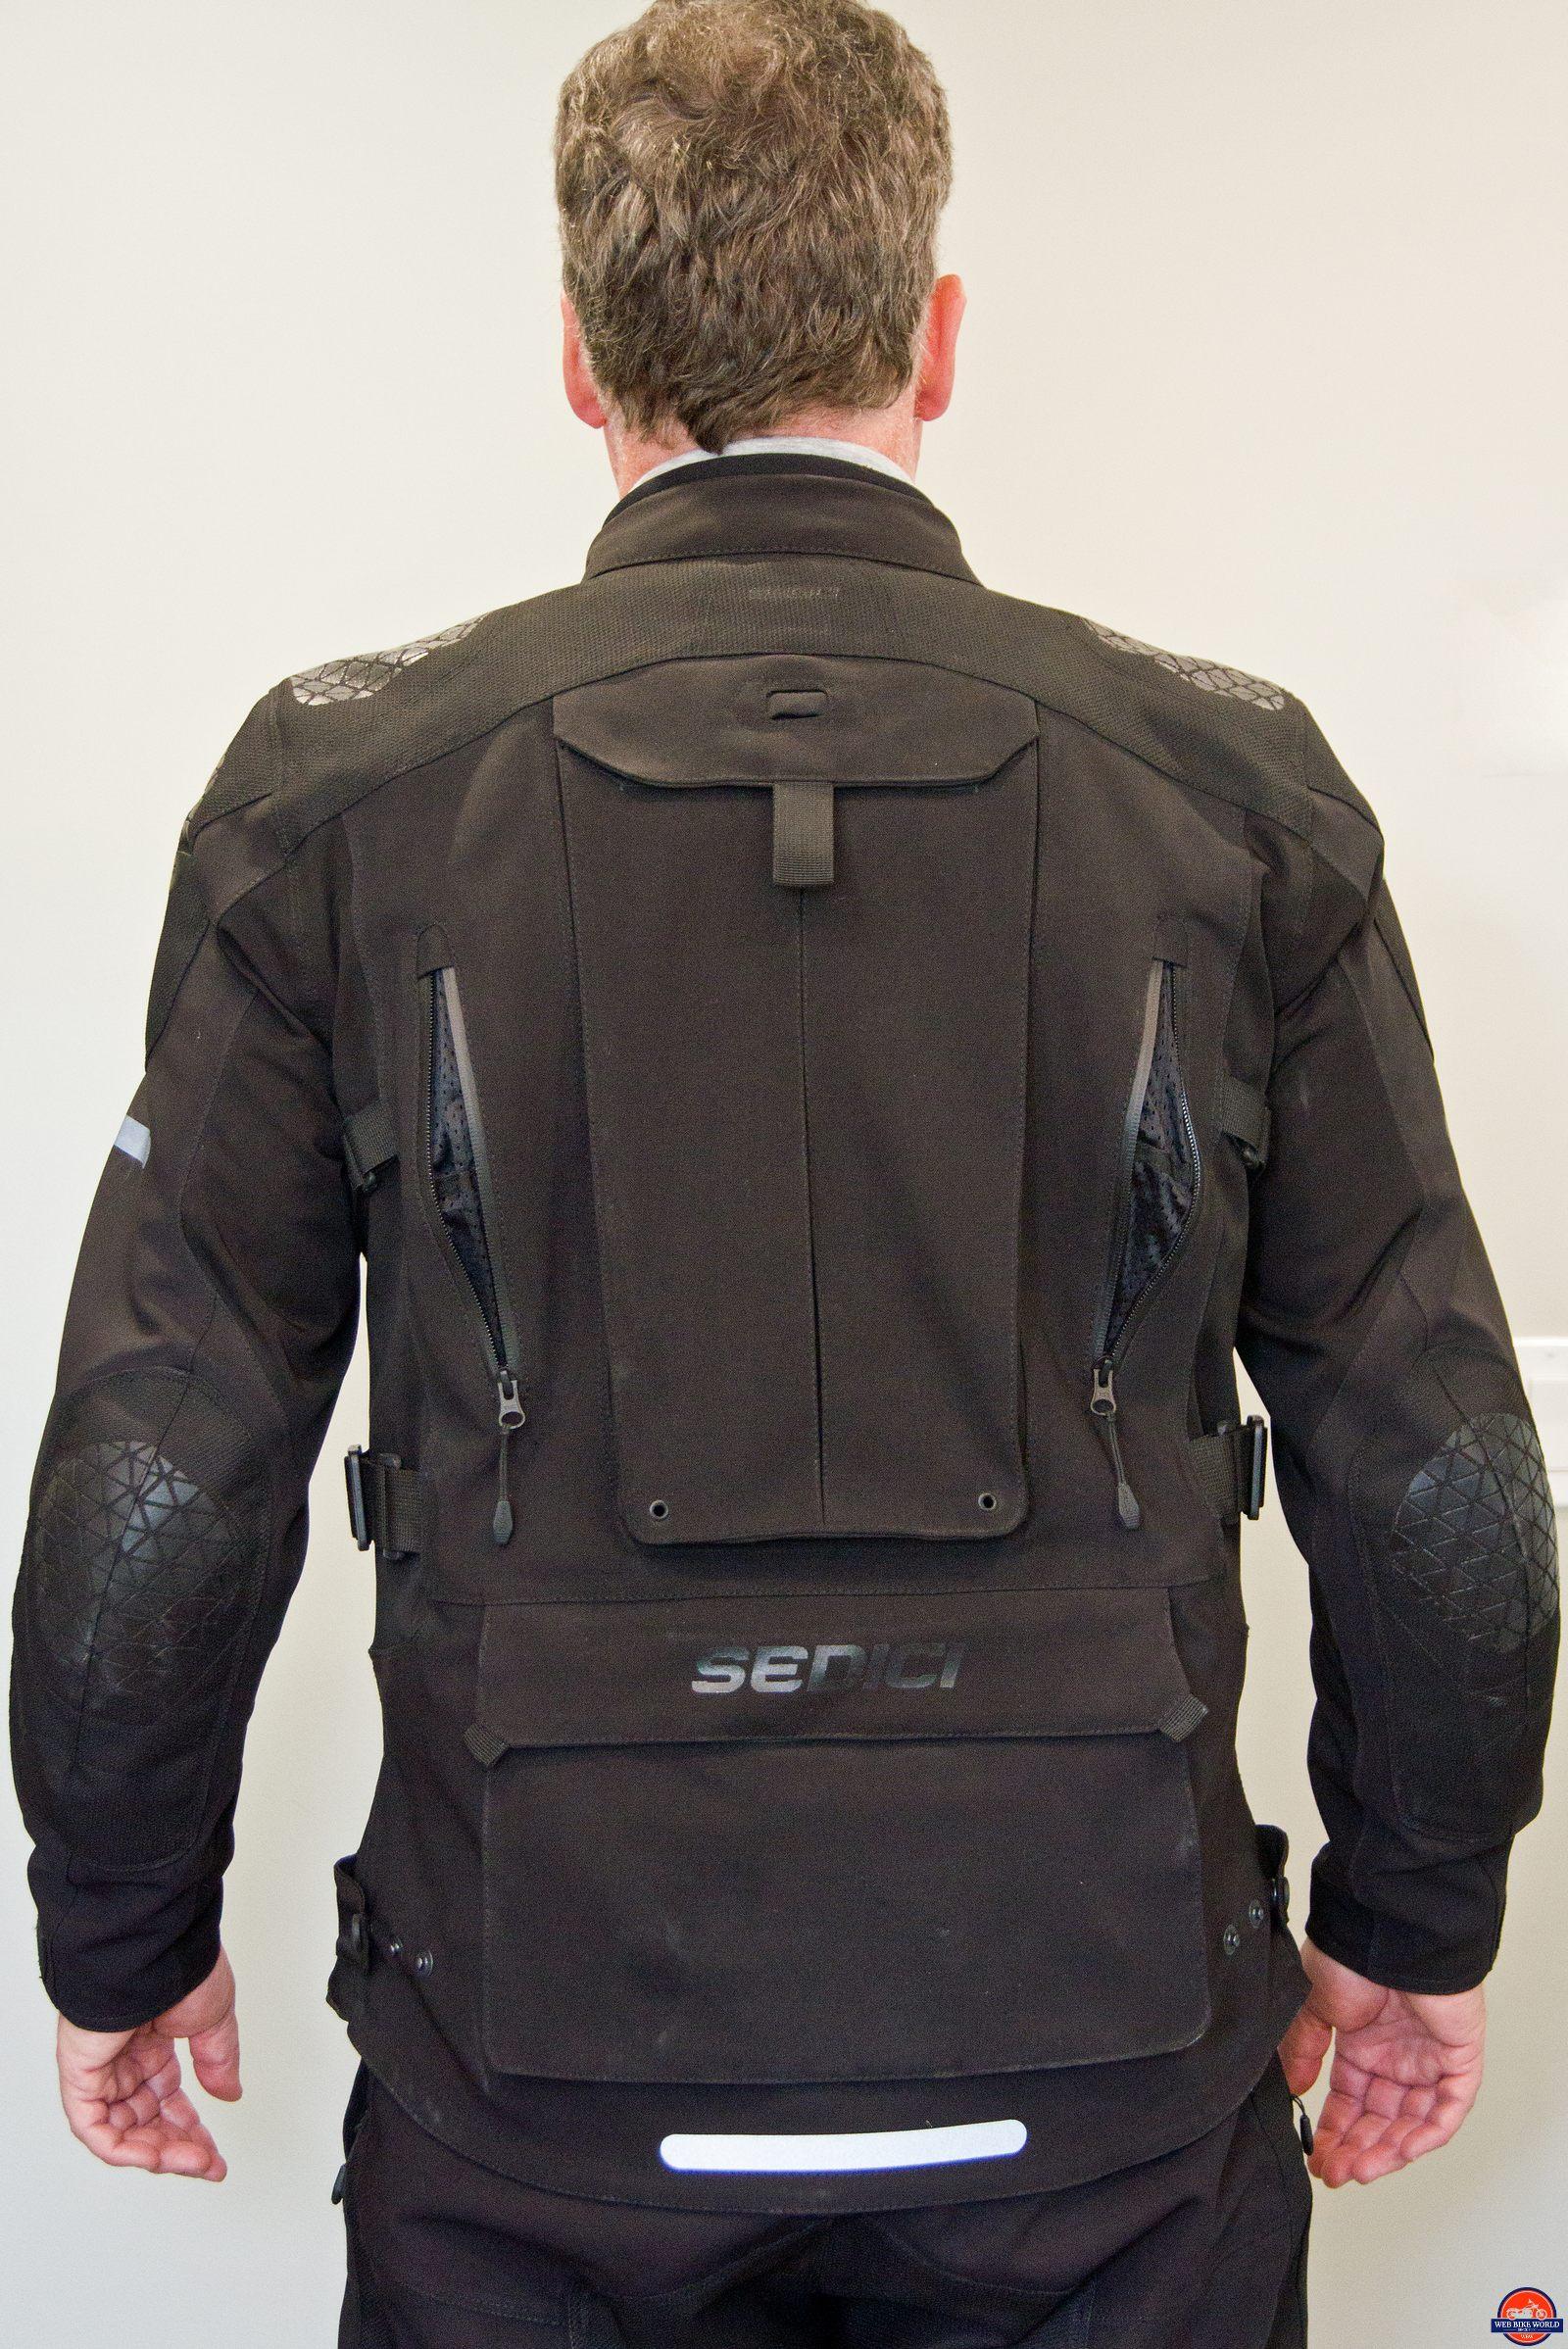 back view of sedici garda jacket